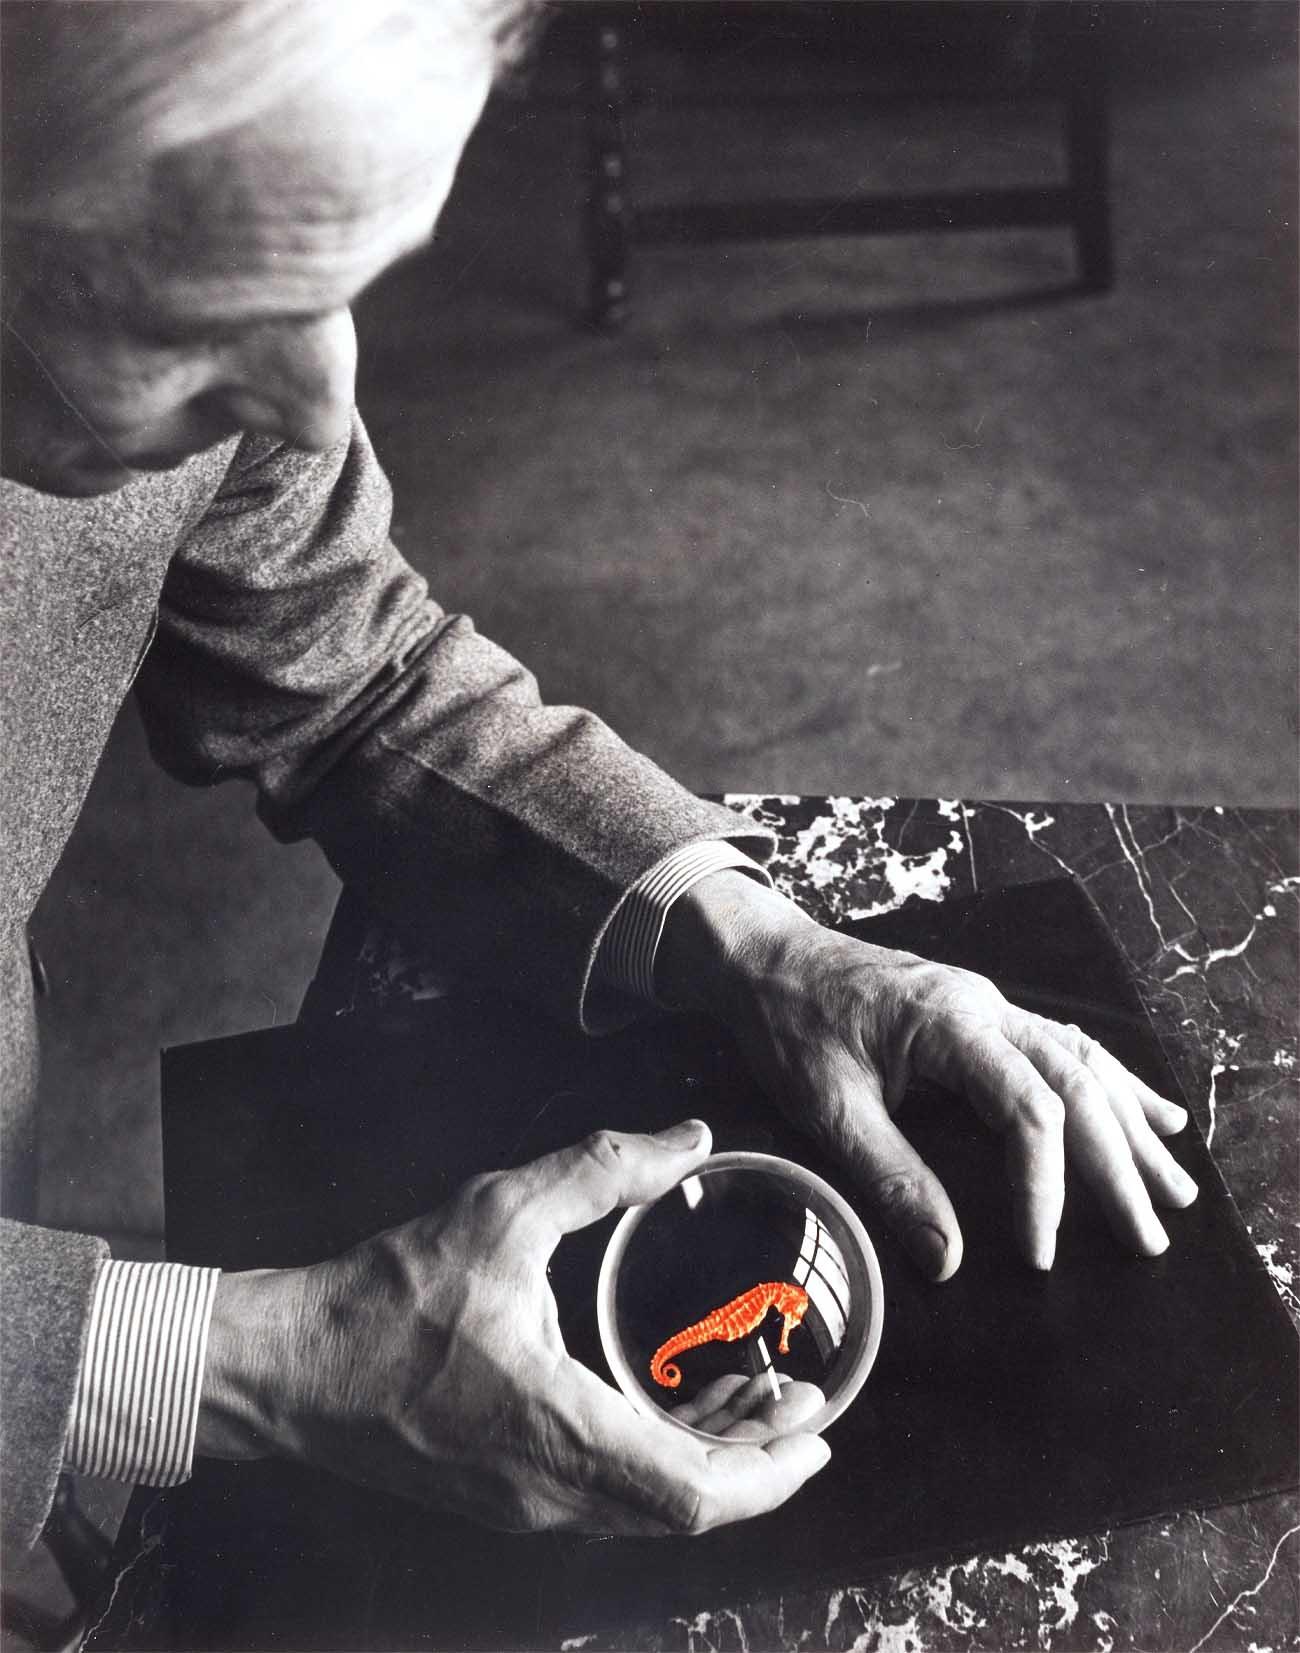 Josef Breitenbach. Max Ernst and the seahorse, New York, 1942.